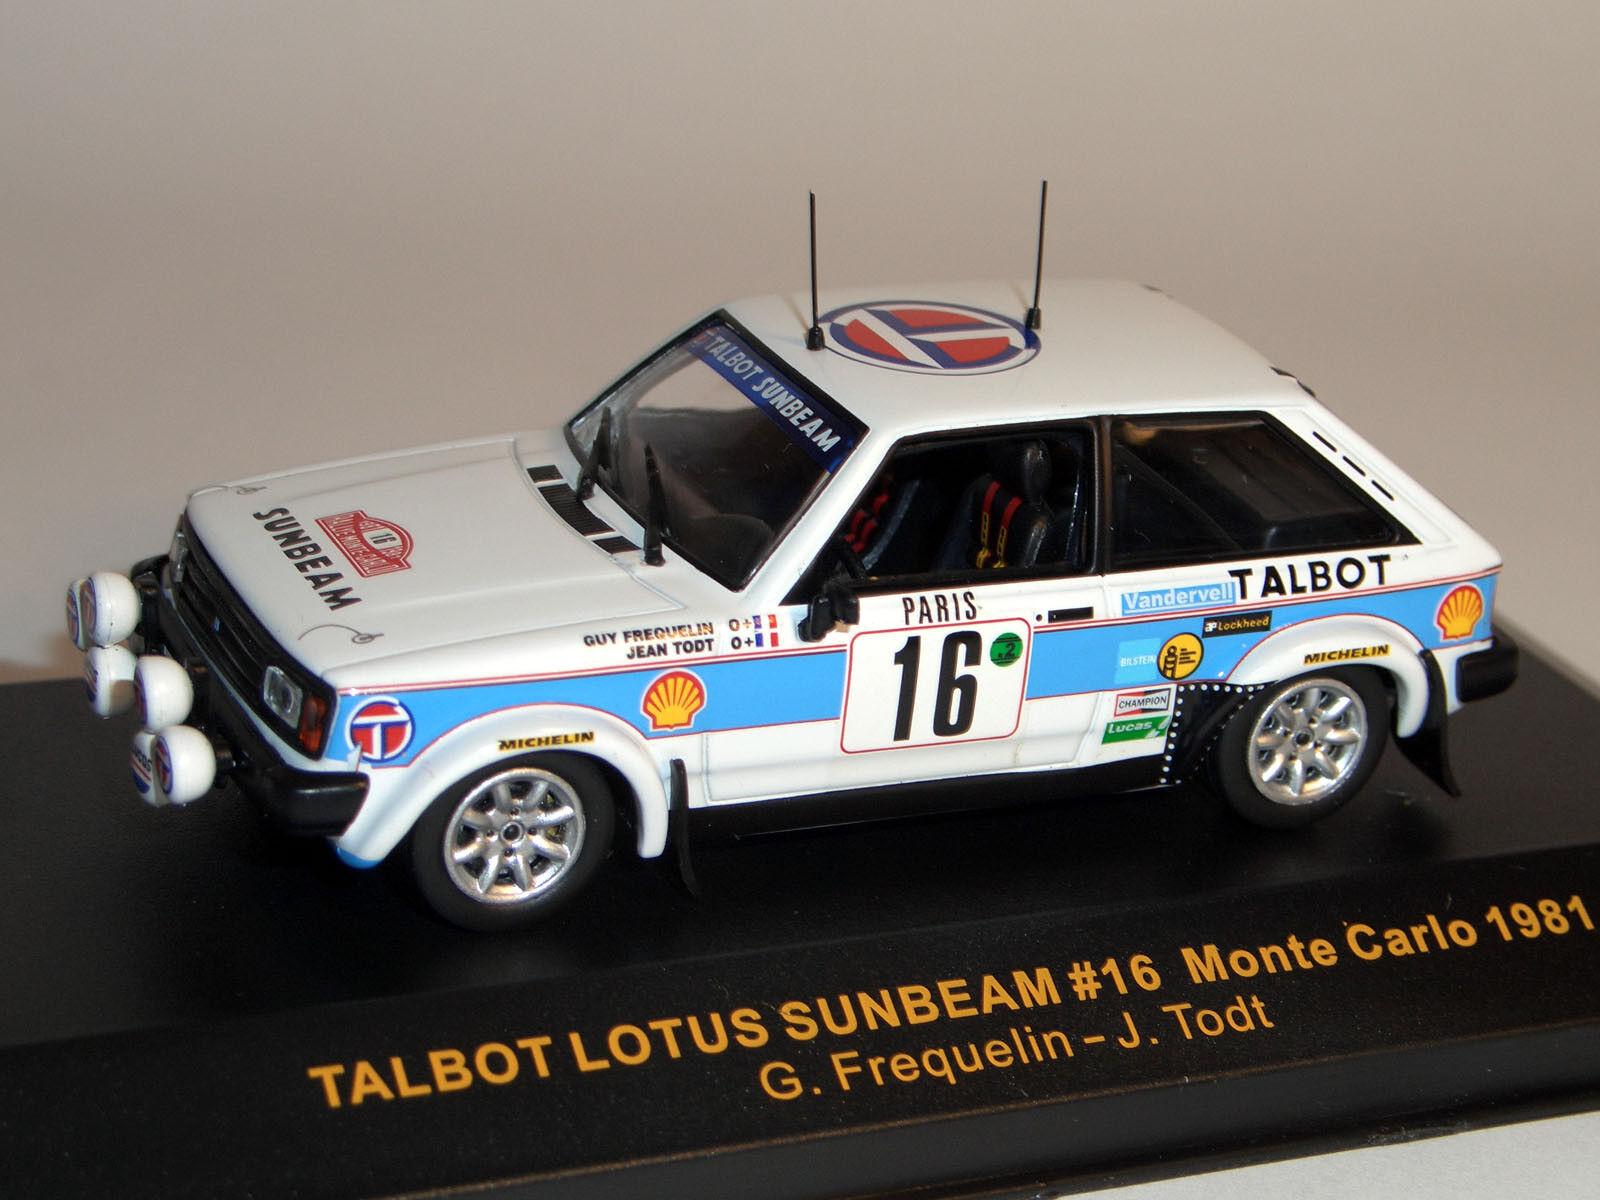 Talbot rallye monte carlo 1981, 1 43 - IXO